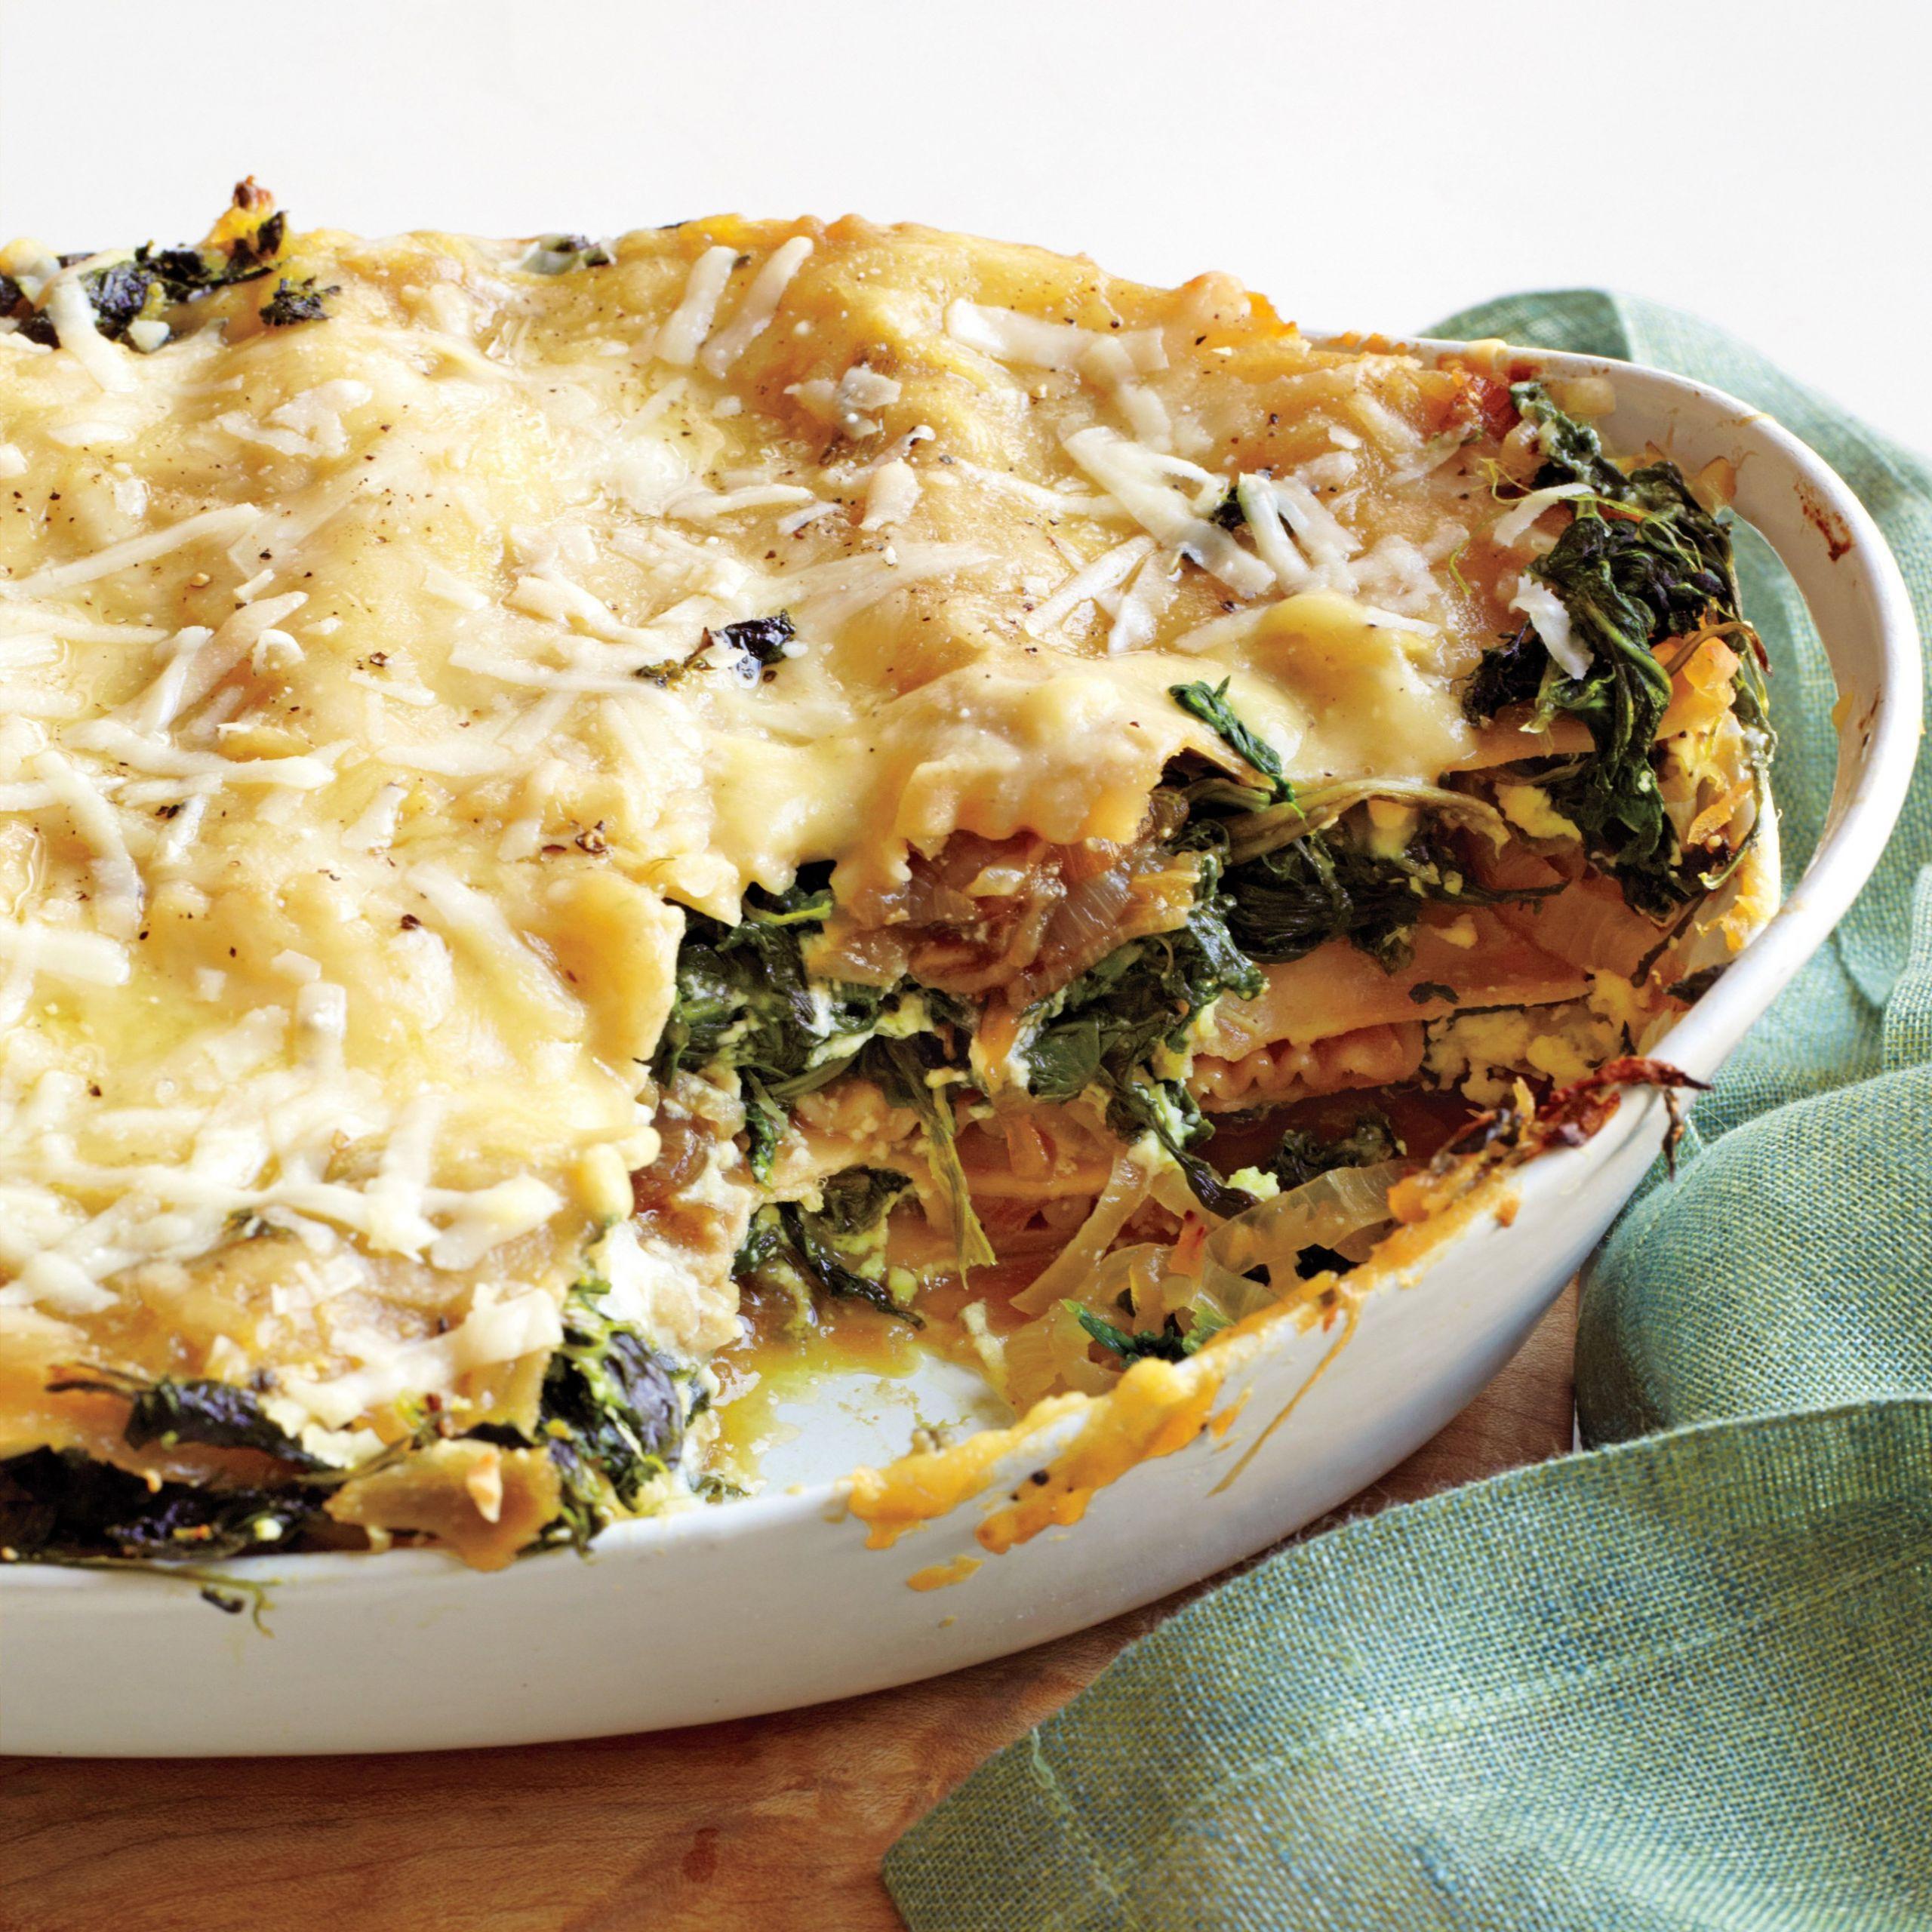 Vegetarian Lasagna Epicurious  The Best Ve arian Lasagna Epicurious Home Family